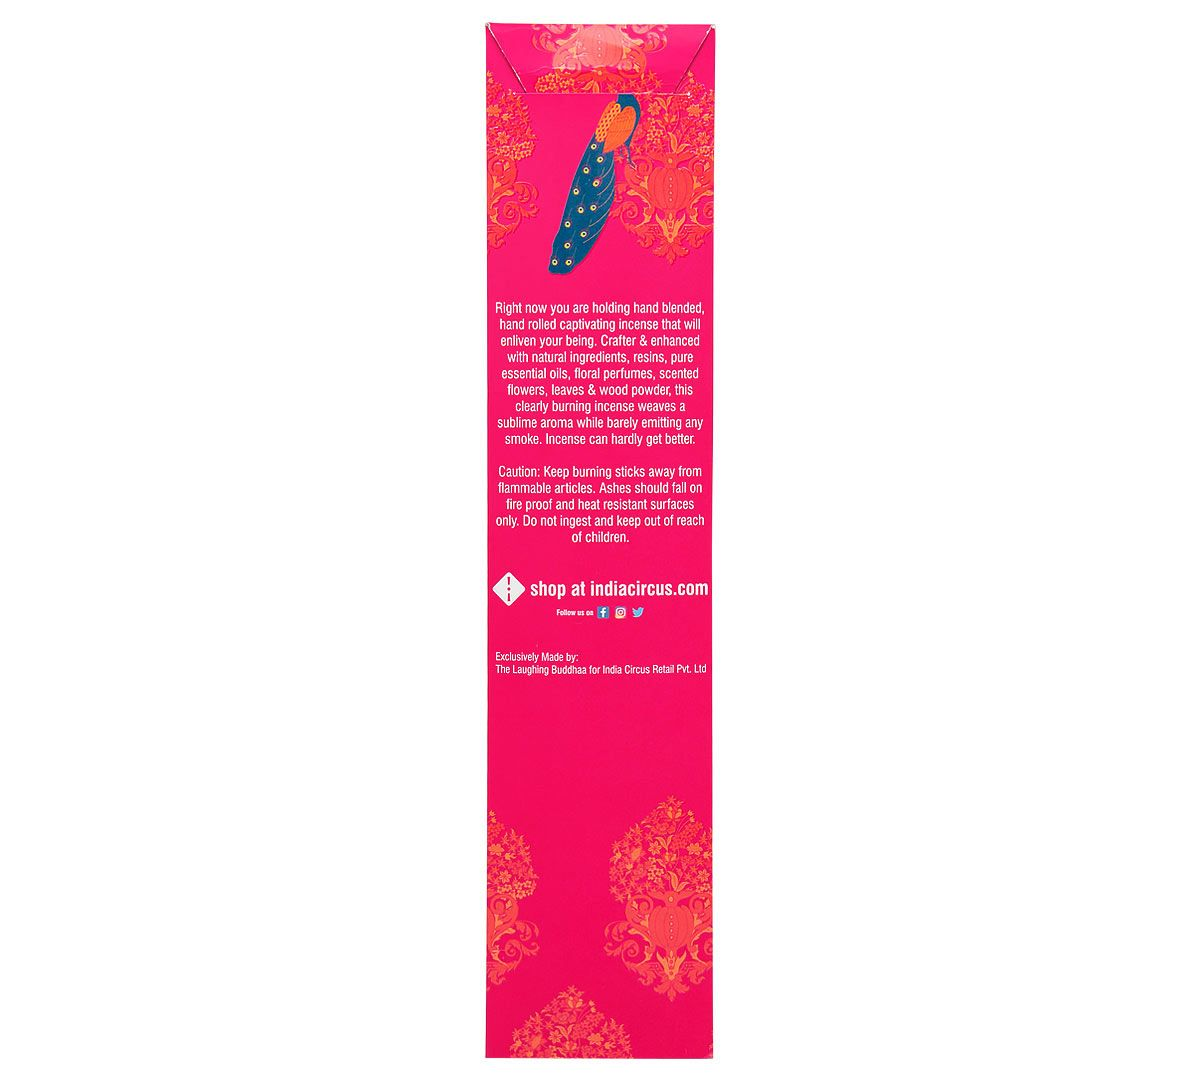 India Circus Lotus Serenity Incense Stick